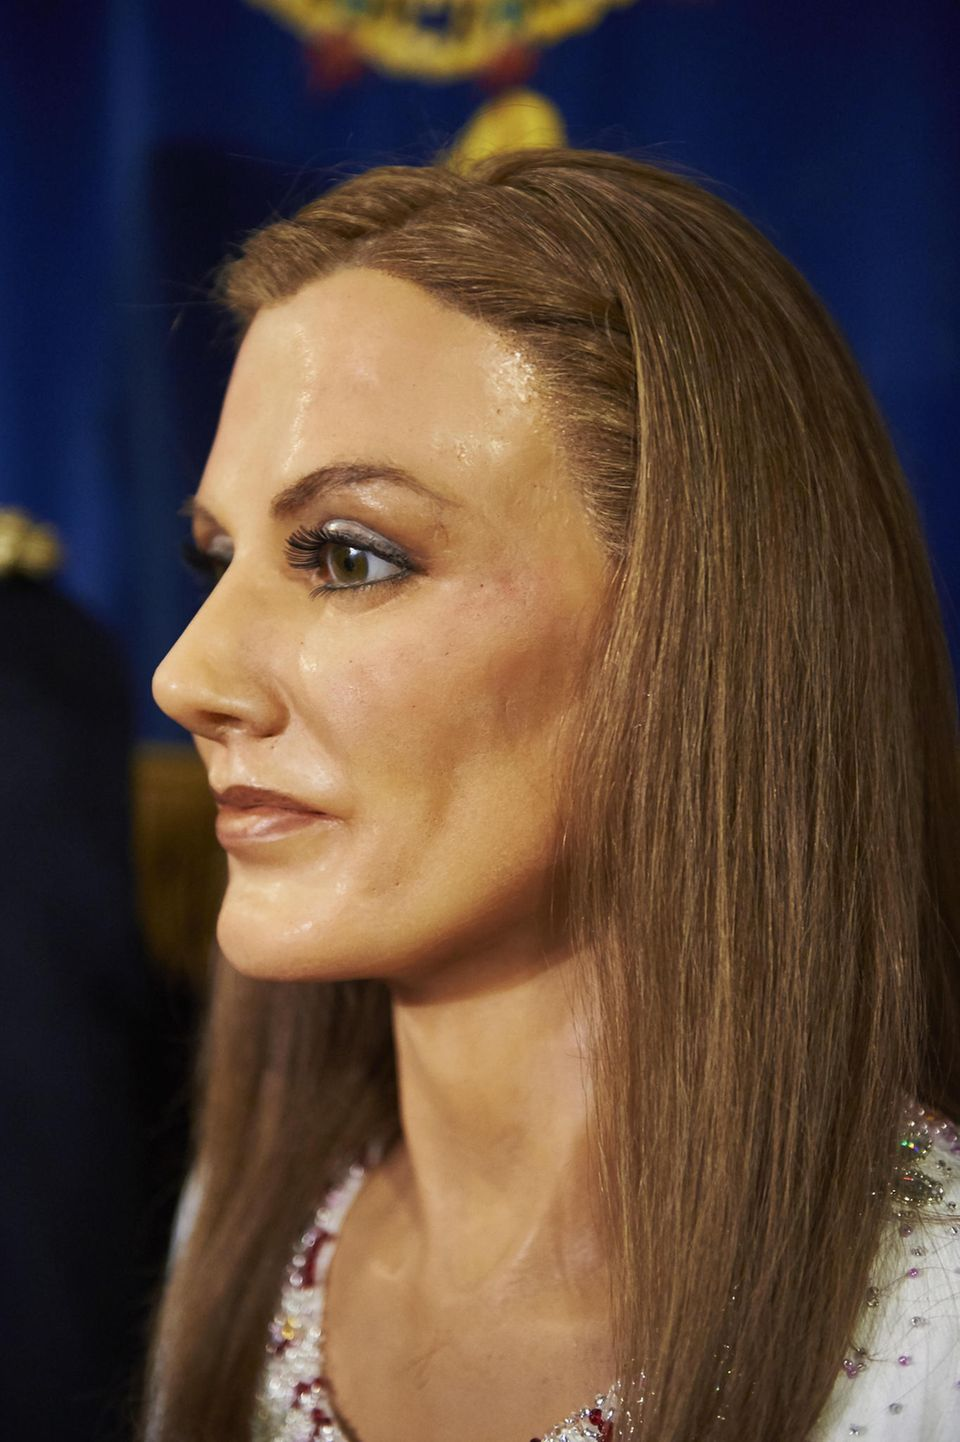 Königin Letizias Wachsfigur im Profil